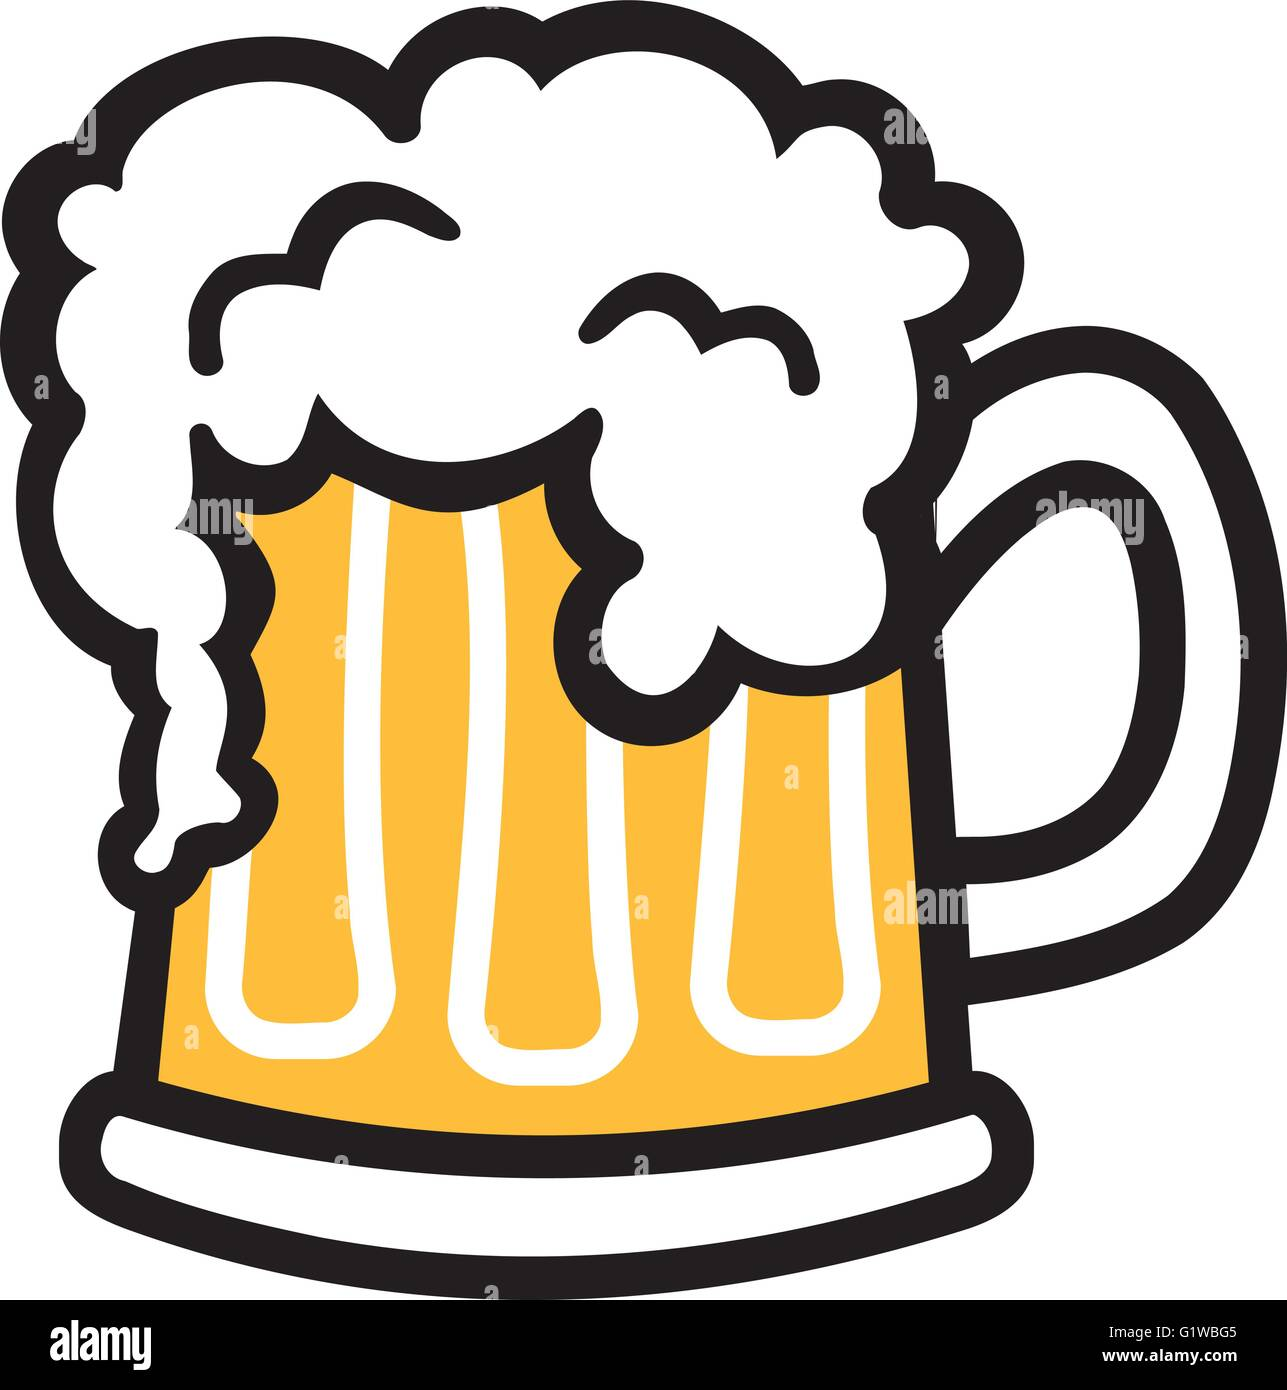 bier becher comic mit schaum vektor abbildung bild logo vectors free download logo vectors example